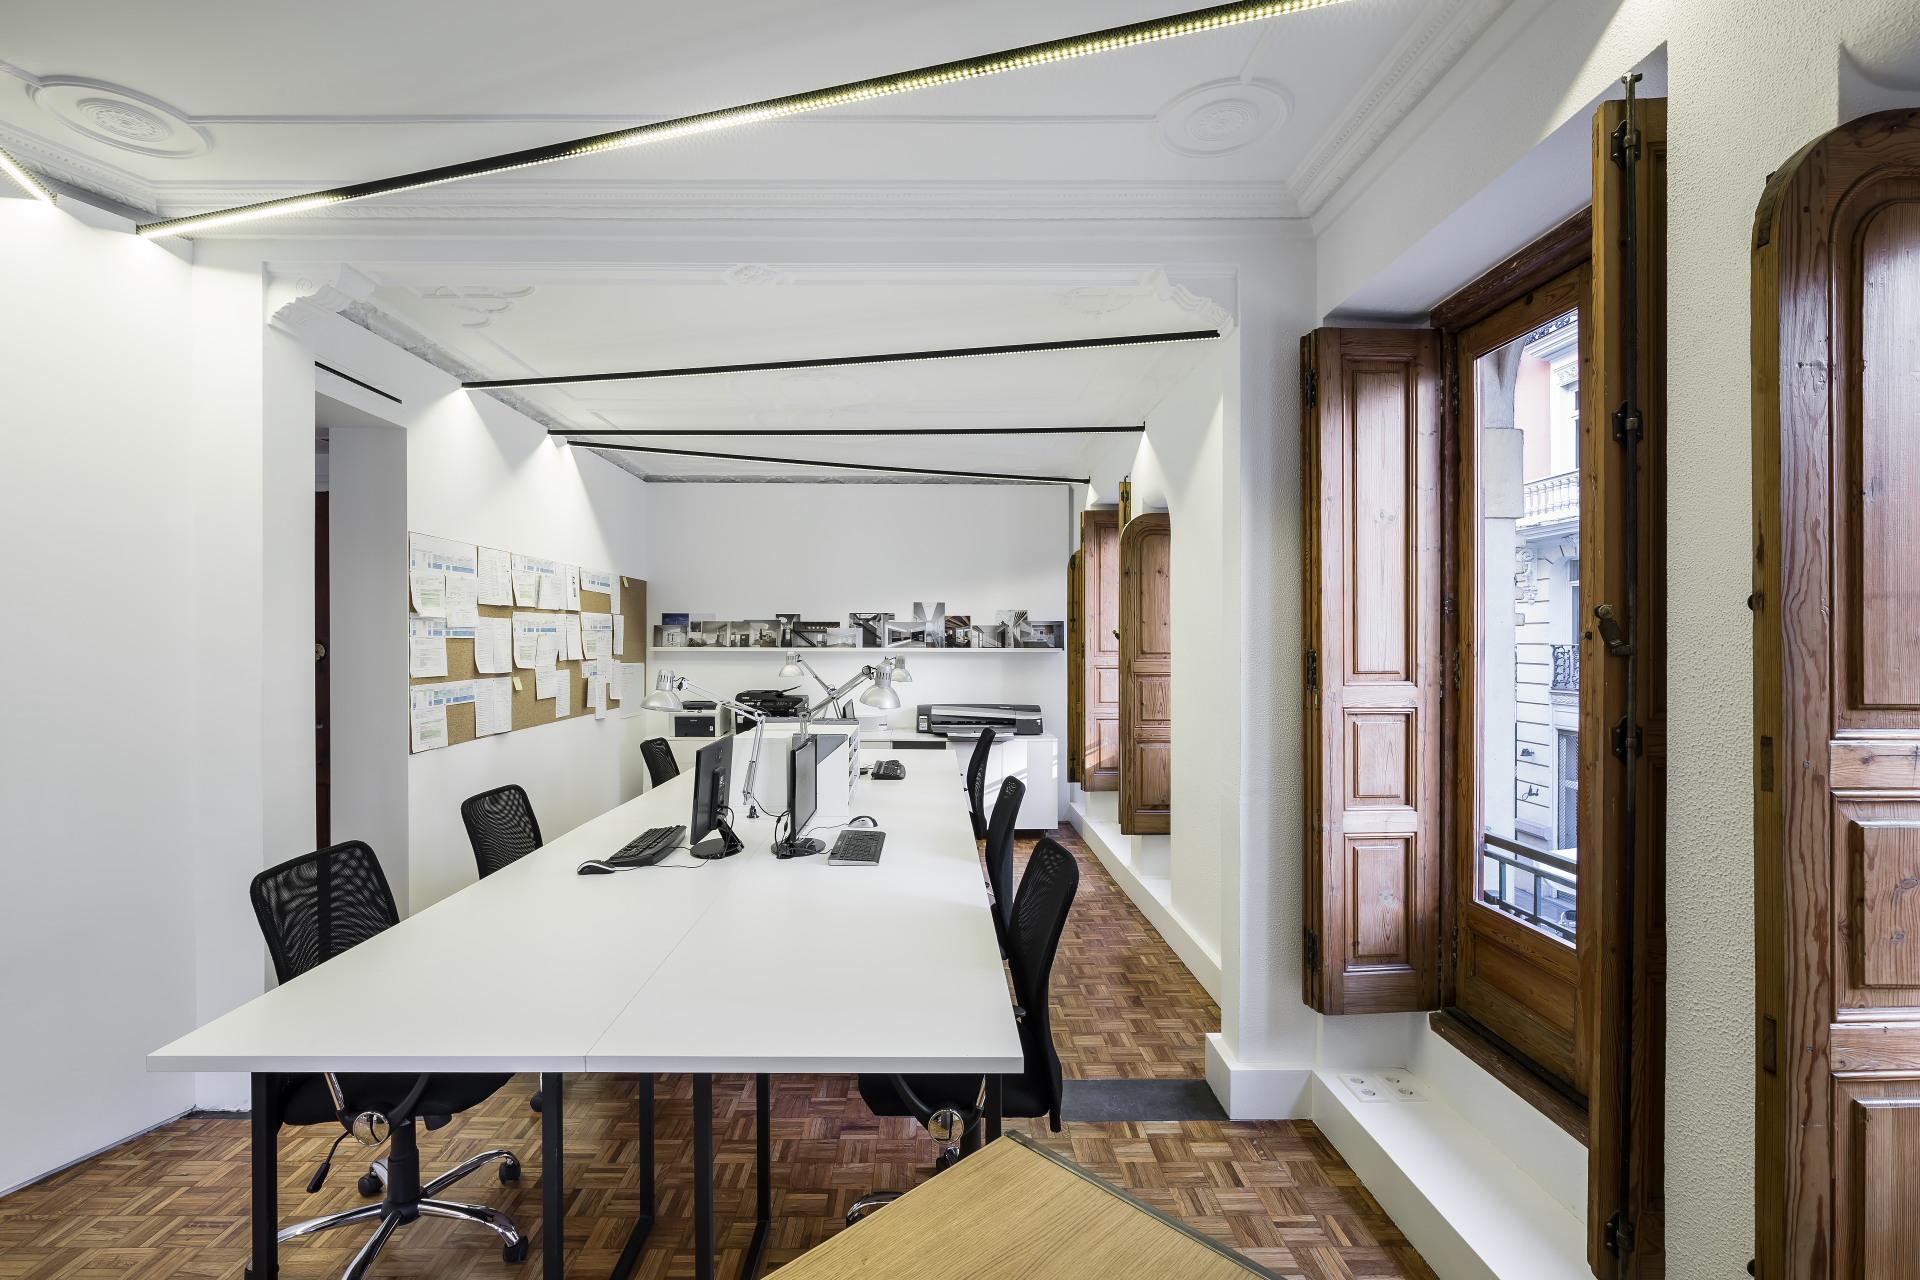 fotografia-arquitectura-interiorismo-valencia-german-cabo-viraje-estudio-pujol (5)